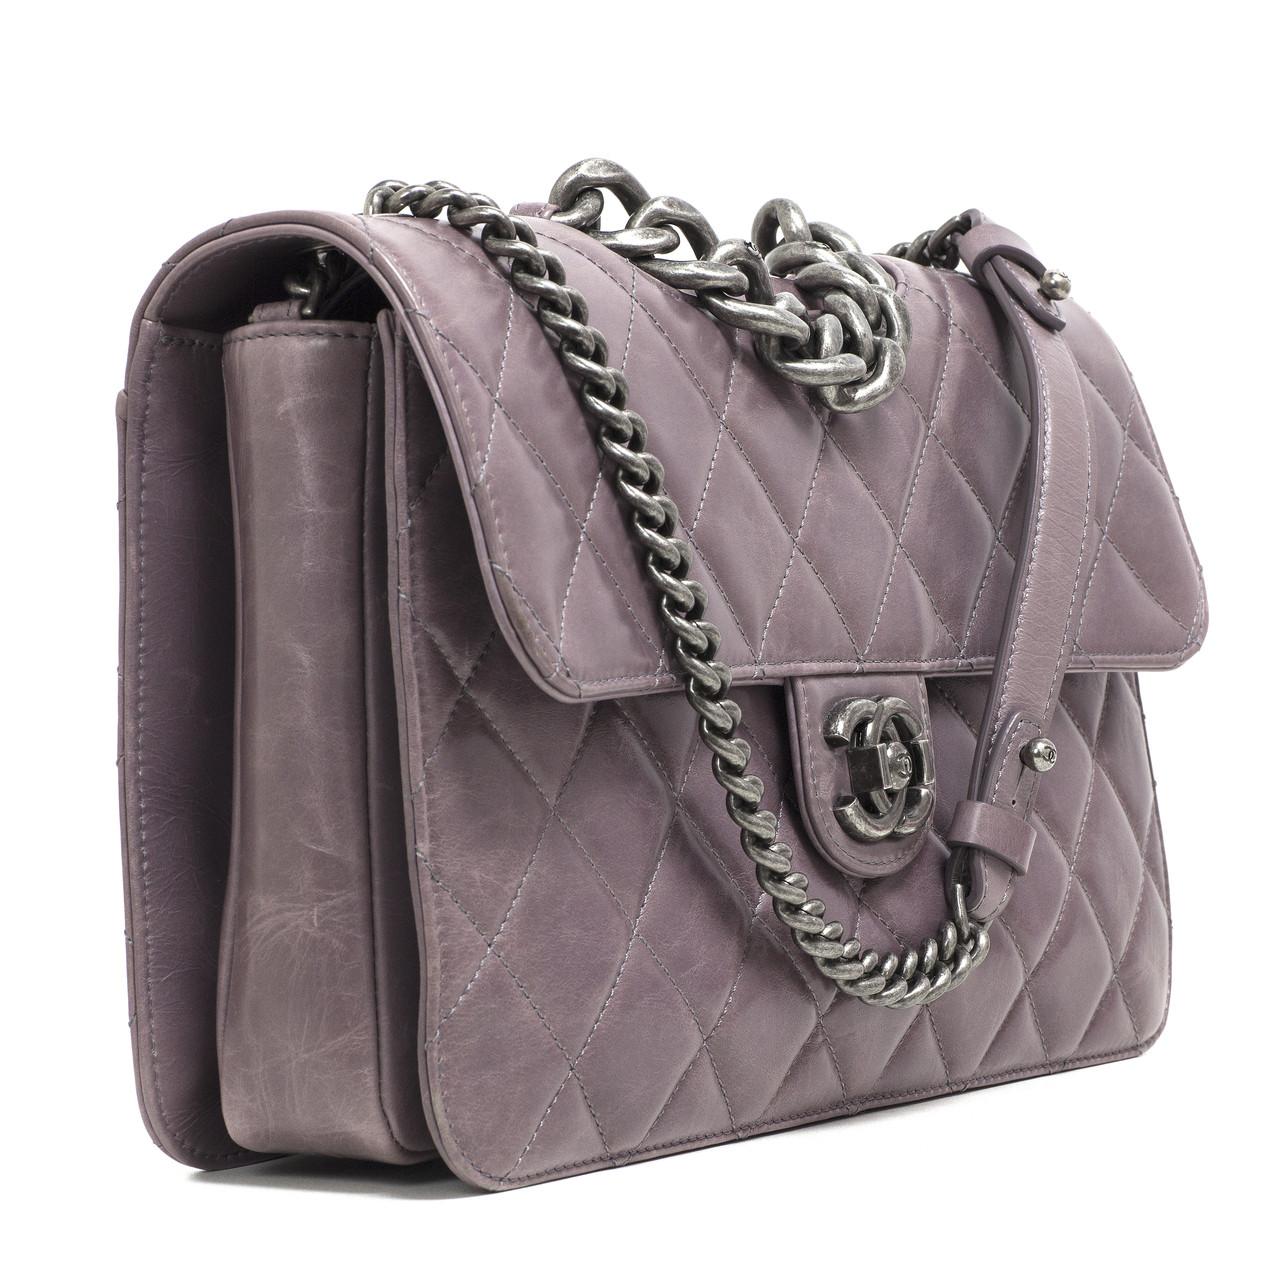 1c599a209e59 Chanel Purple Quilted Calfskin Medium Perfect Edge Flap - modaselle